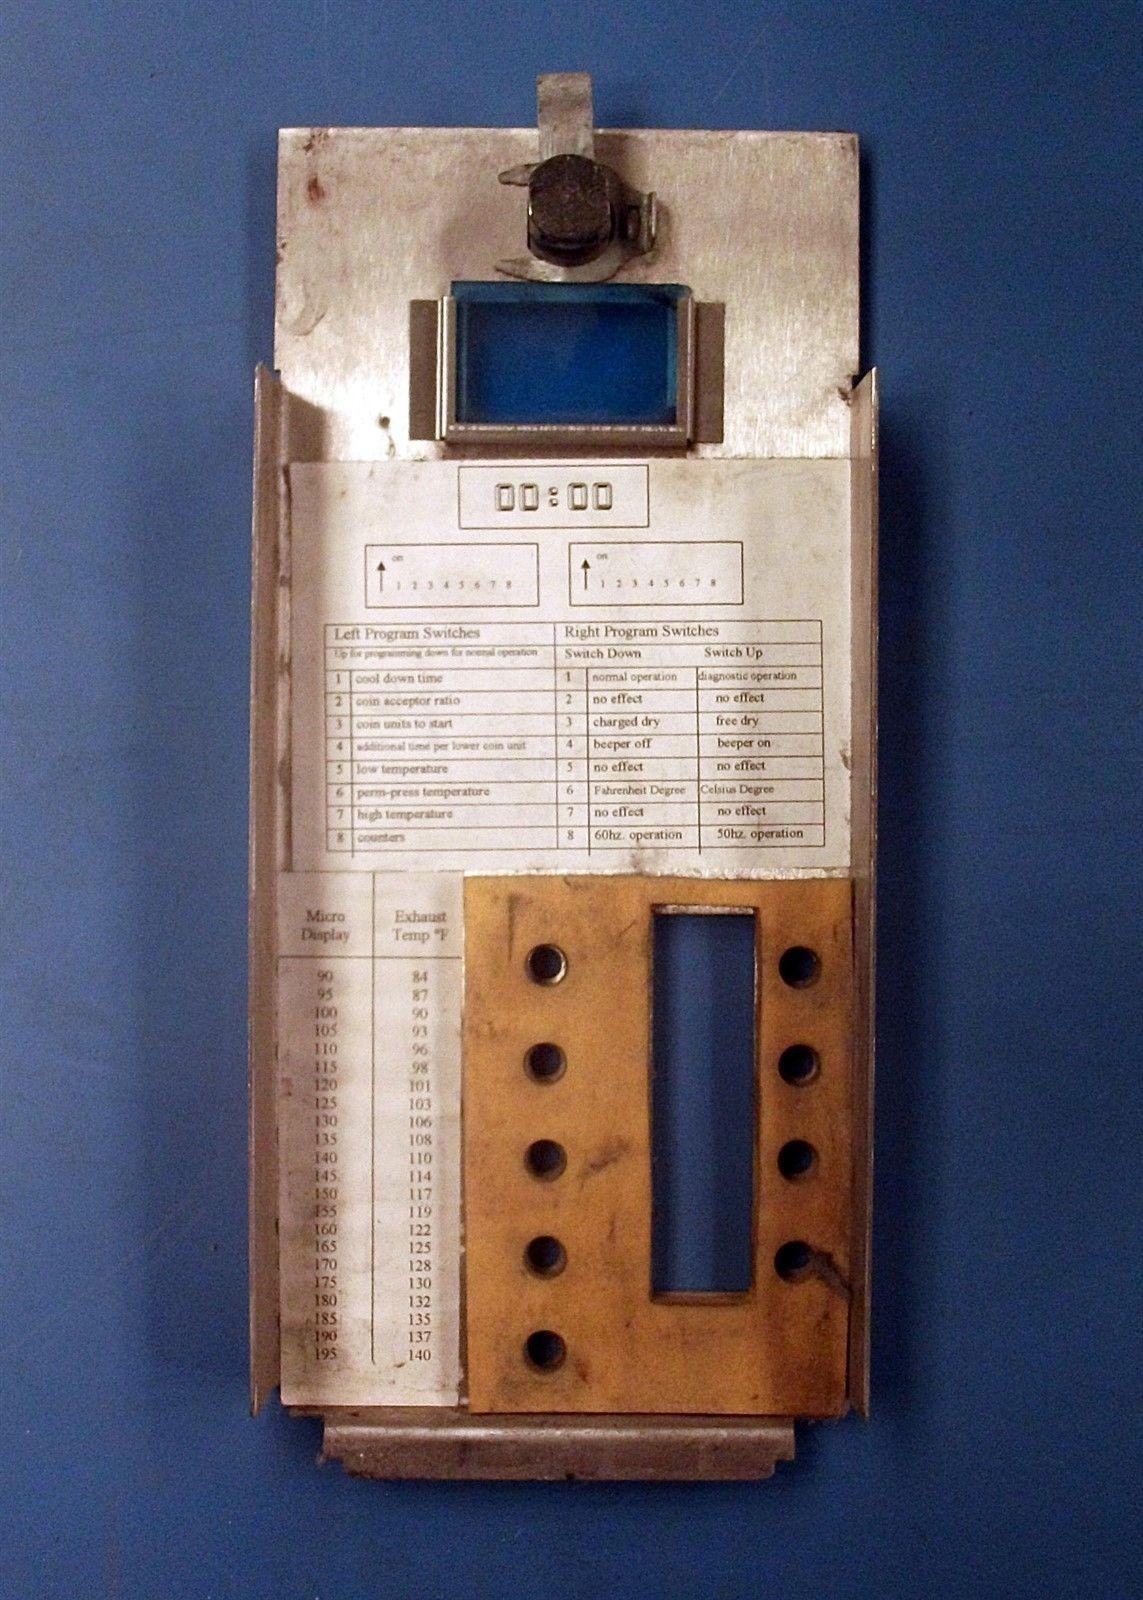 Wascomat Speed Queen Huebsch Lower Dryer Control Faceplate Model scd32dg